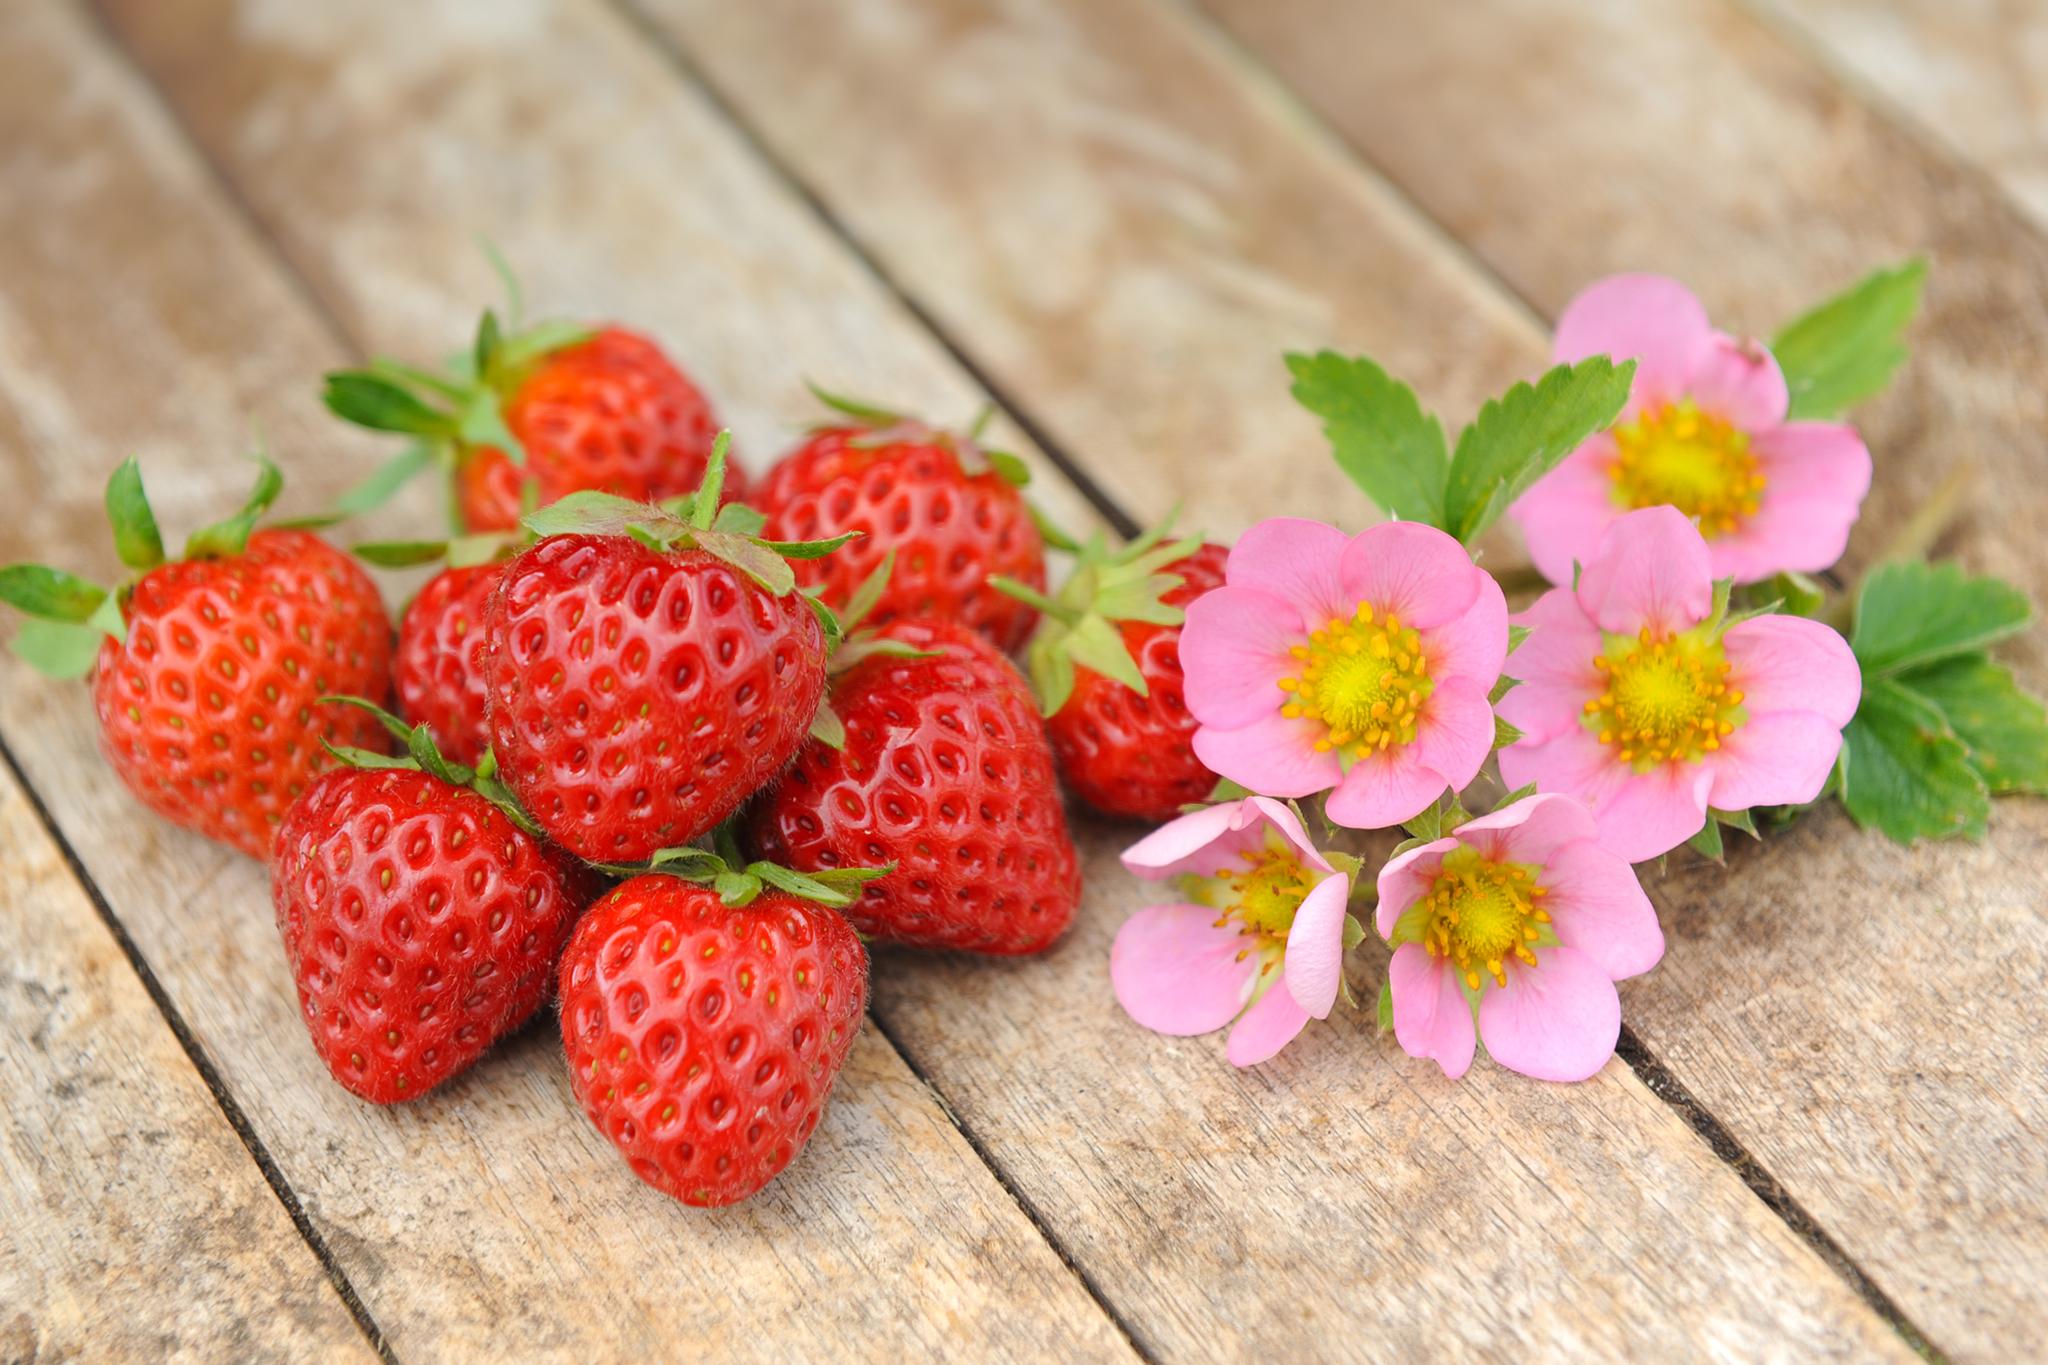 tandm-strawberries